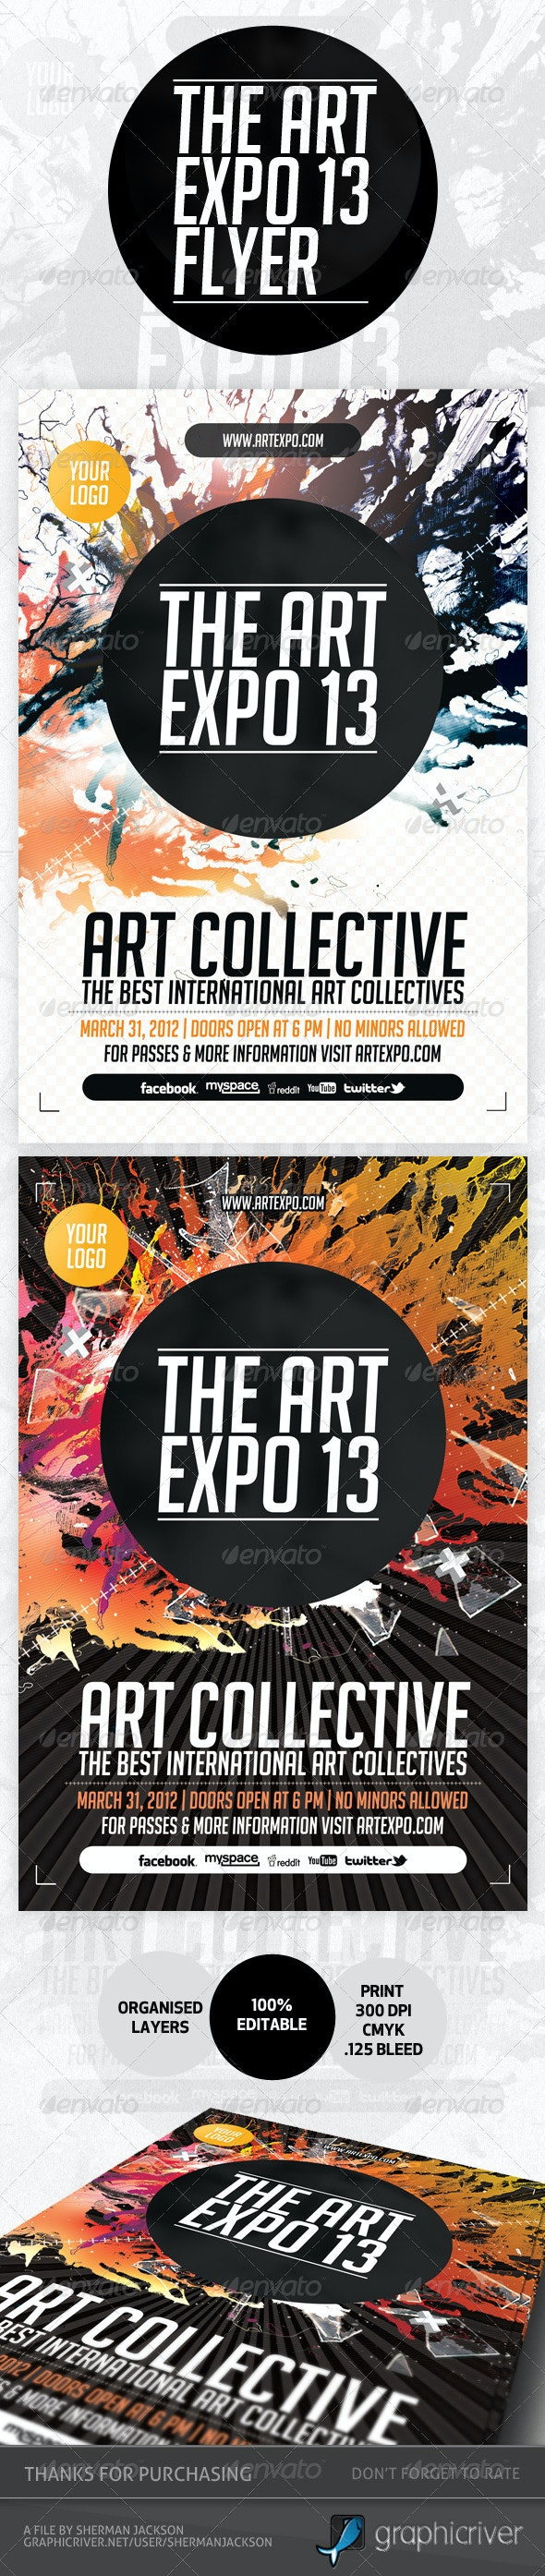 Art Expo & Art Show Event Flyer Template PSD - Miscellaneous Events